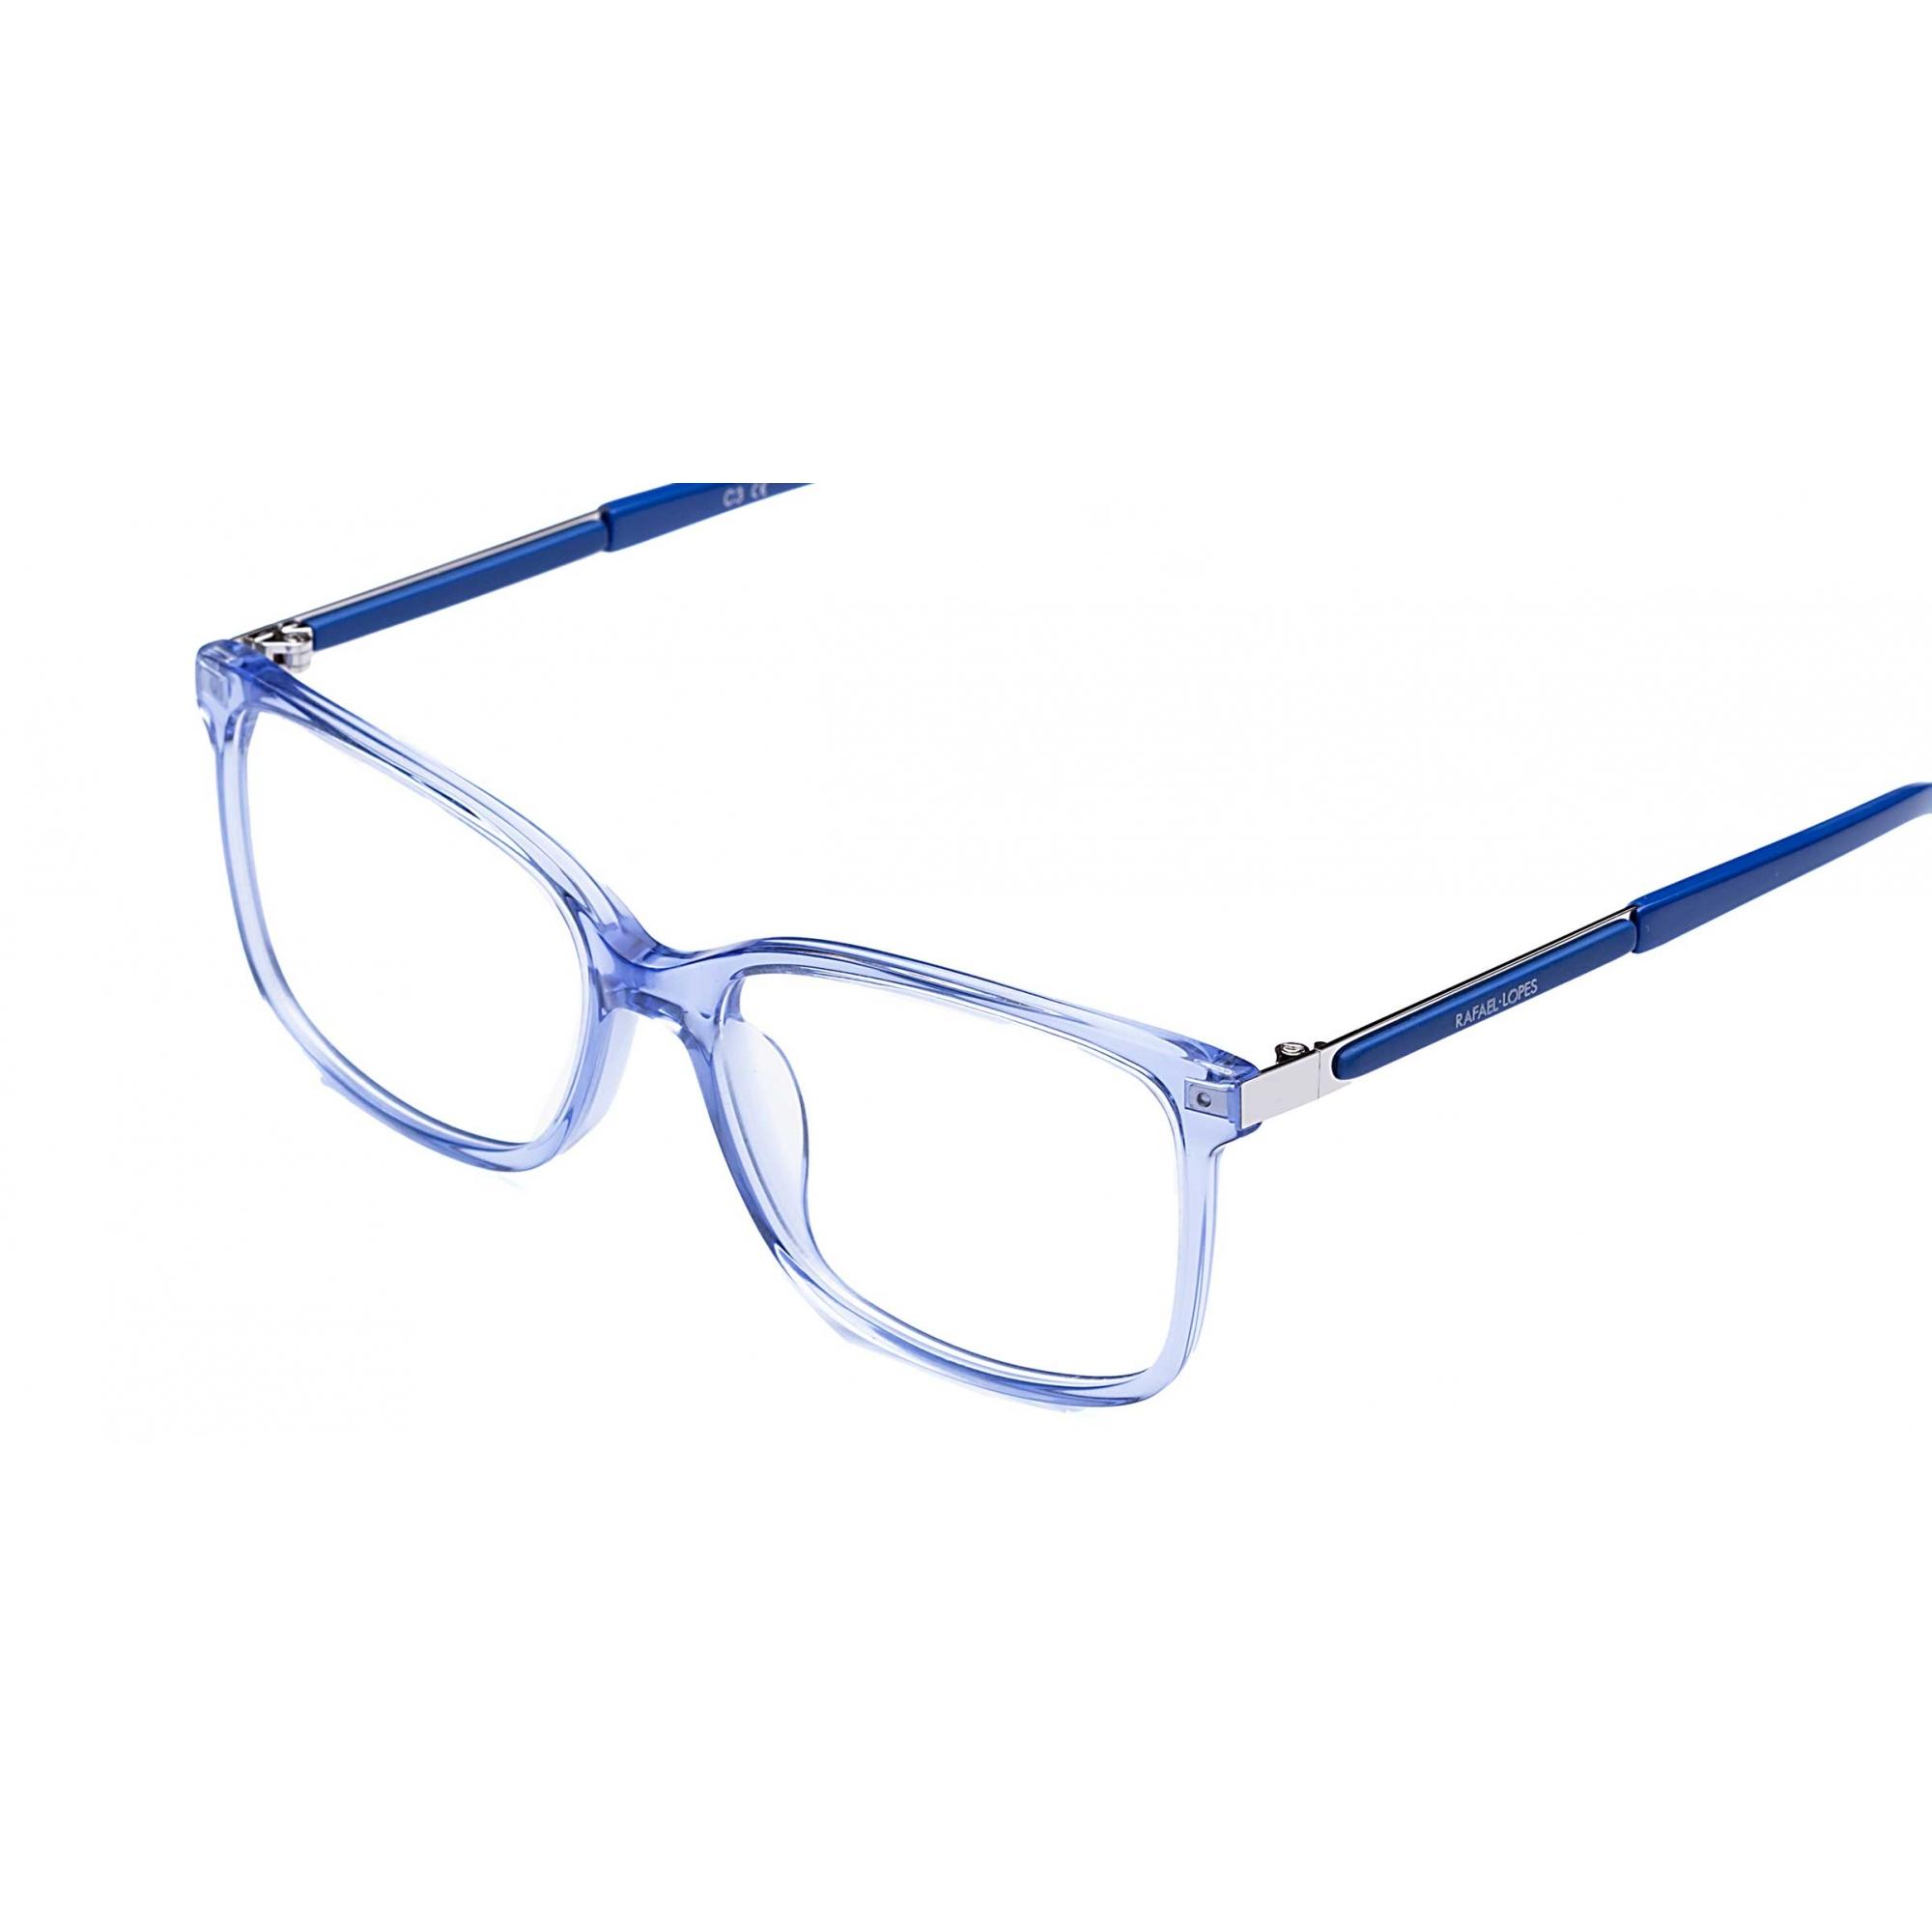 Óculos de Grau Story Rafael Lopes Eyewear - Infantil